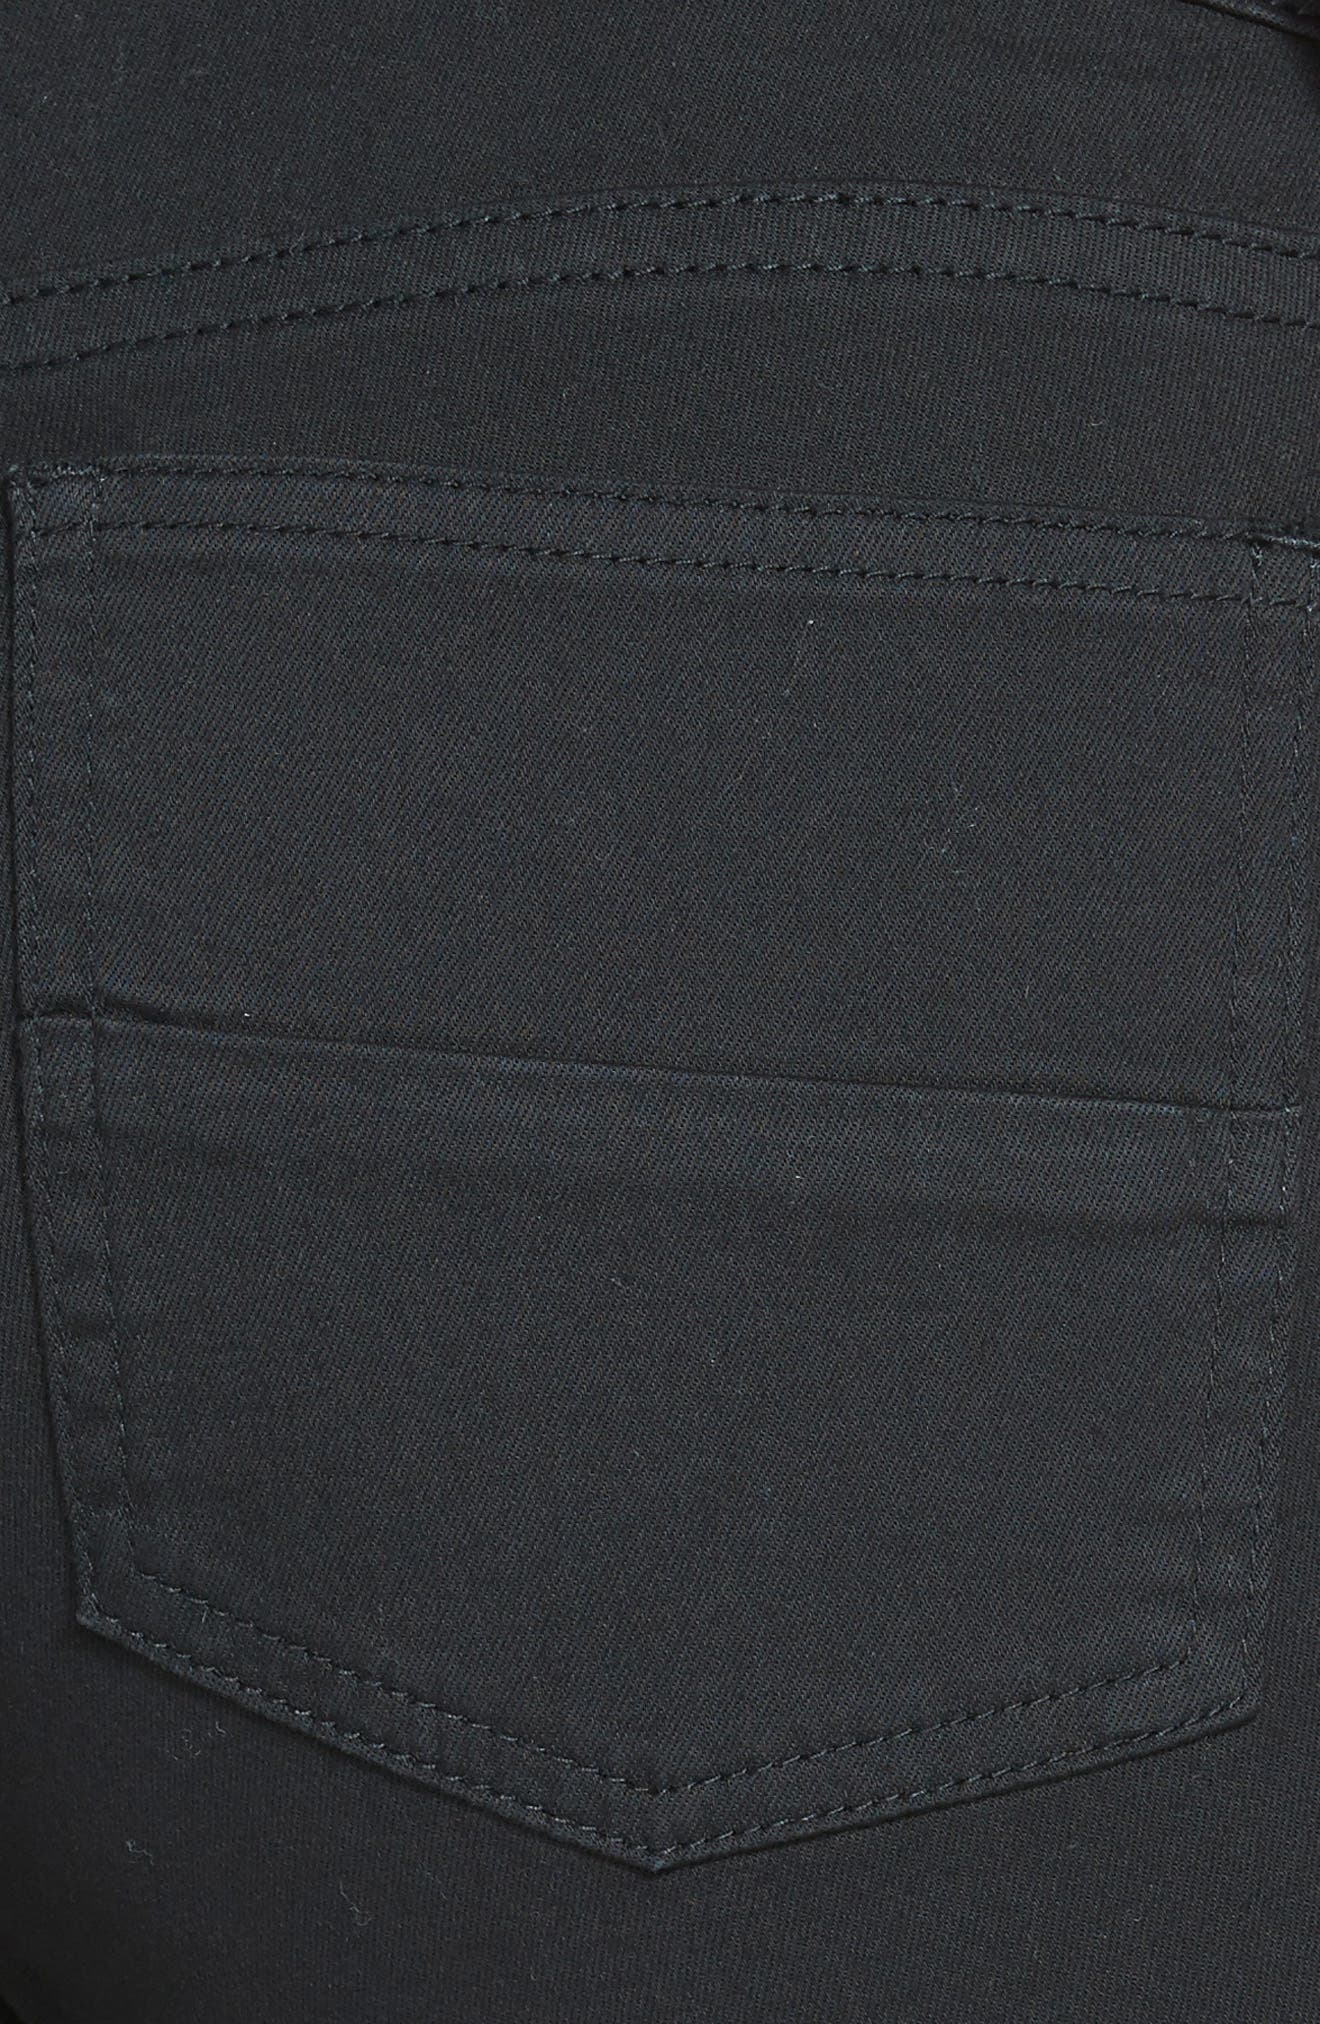 'Natalie' Twill Bermuda Shorts,                             Alternate thumbnail 6, color,                             001